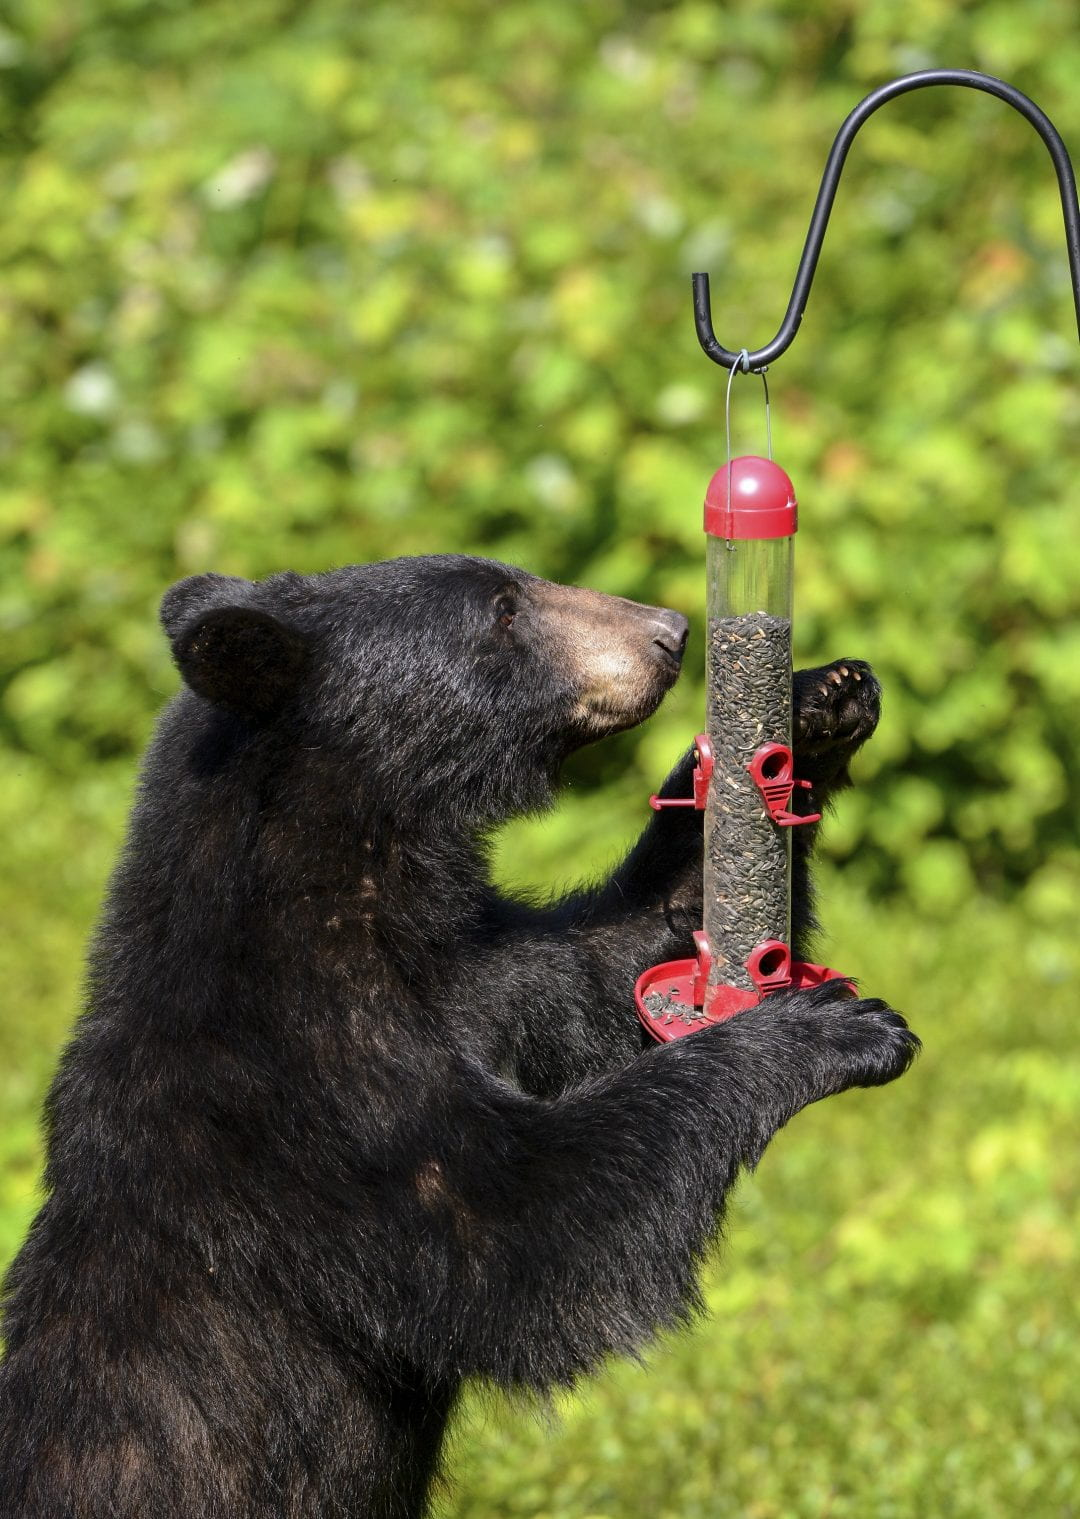 bear eating bird food